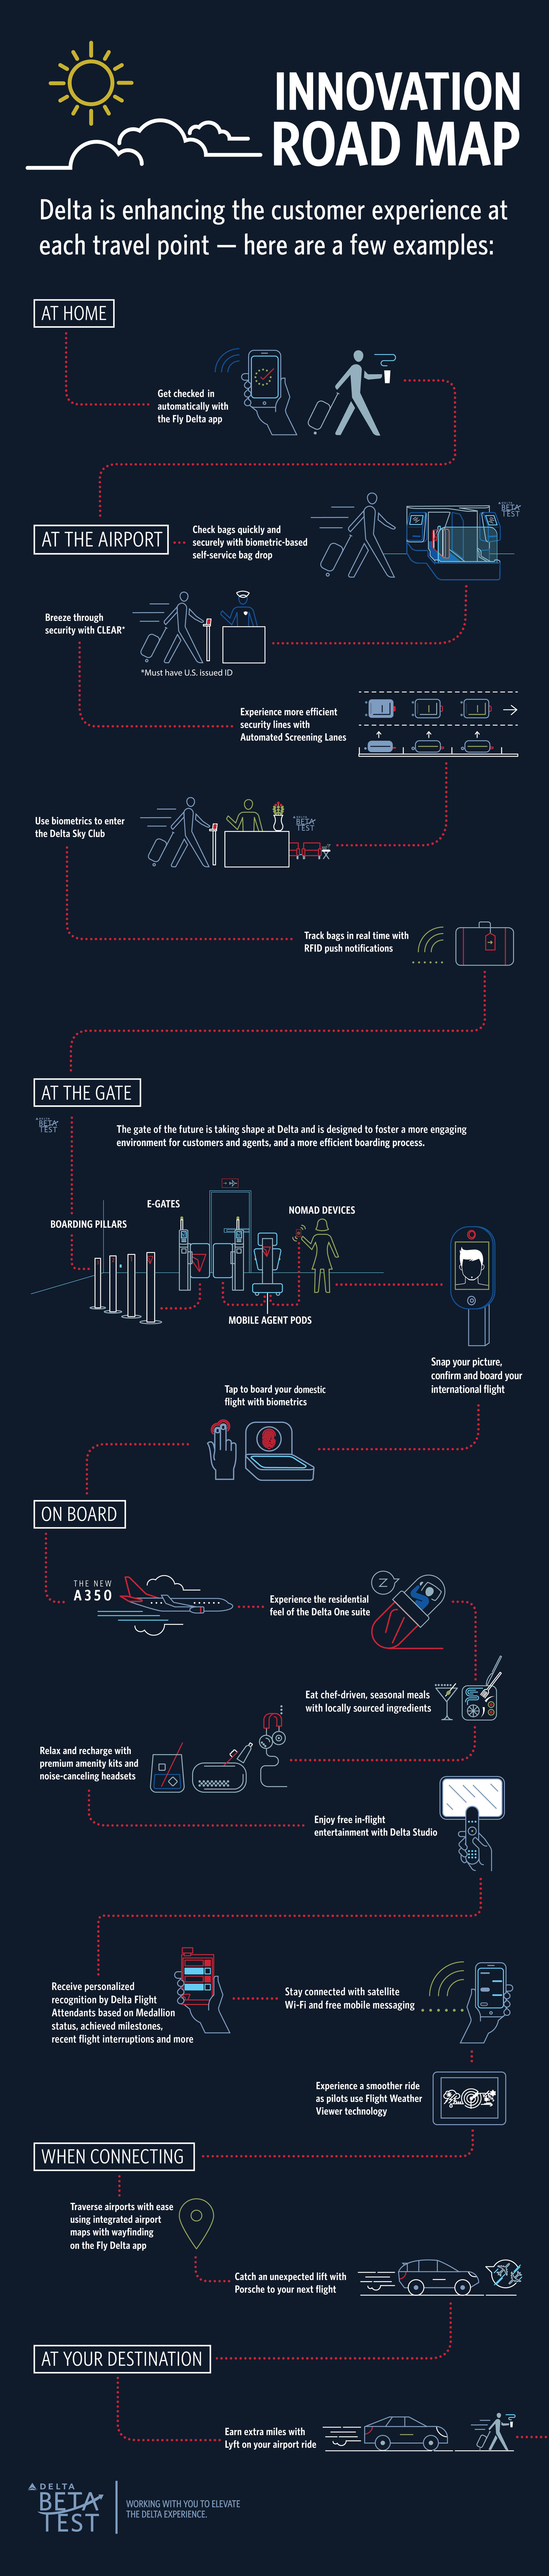 Innovation Road Map_12.15